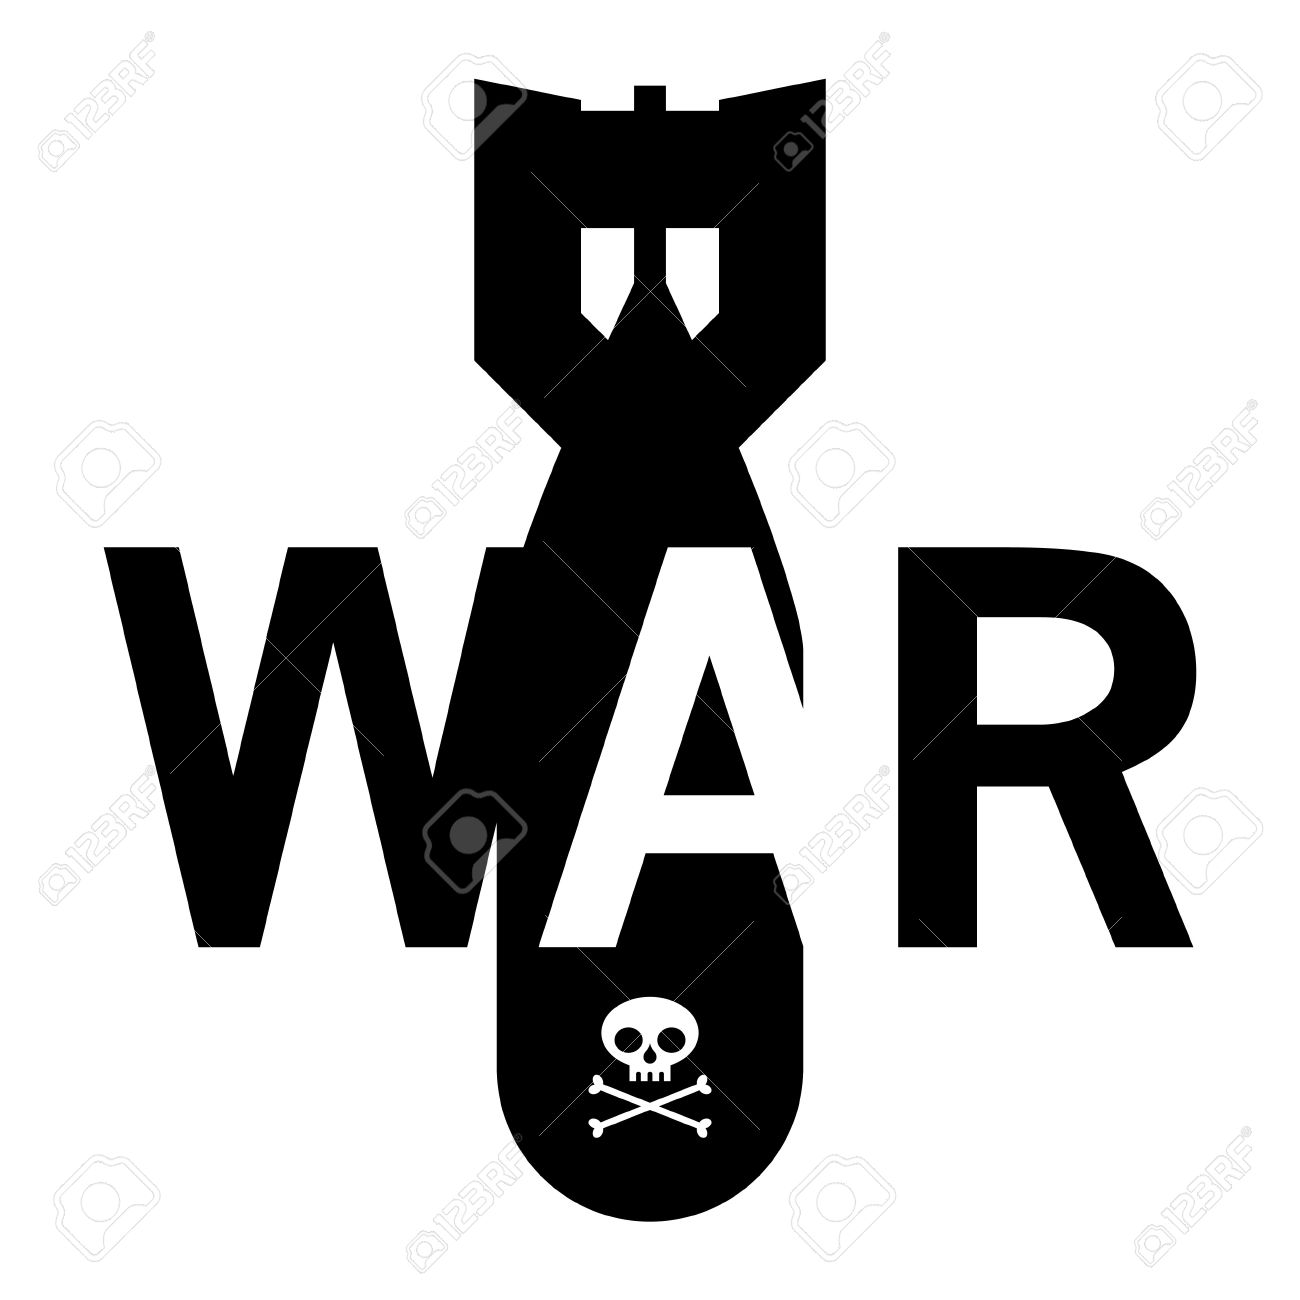 War bomb skull bones fear danger symbol royalty free cliparts war bomb skull bones fear danger symbol stock vector 18062913 biocorpaavc Images